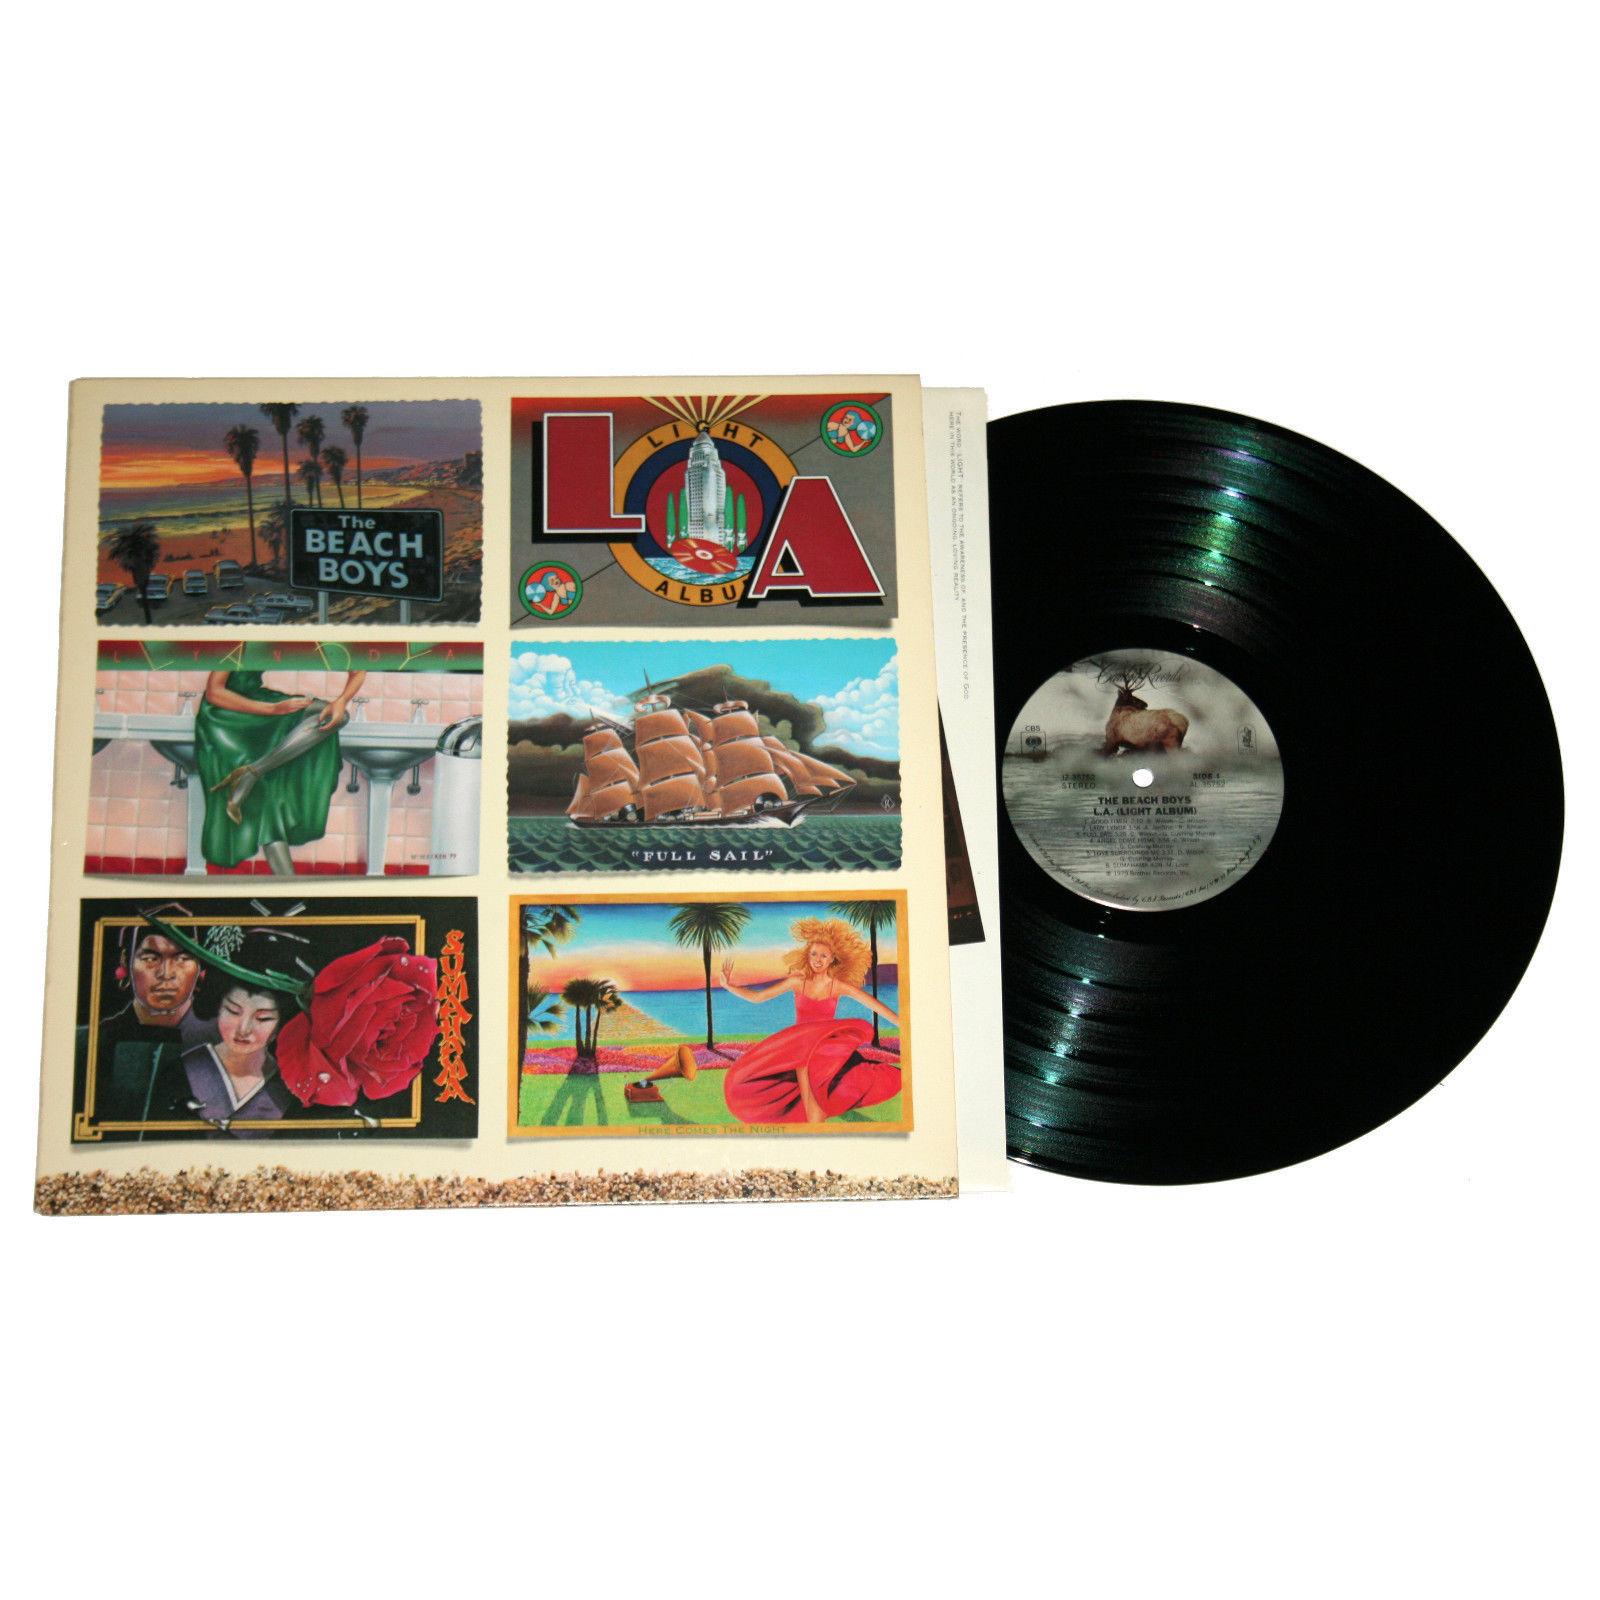 The Beach Boys - Light Album on Vinyl